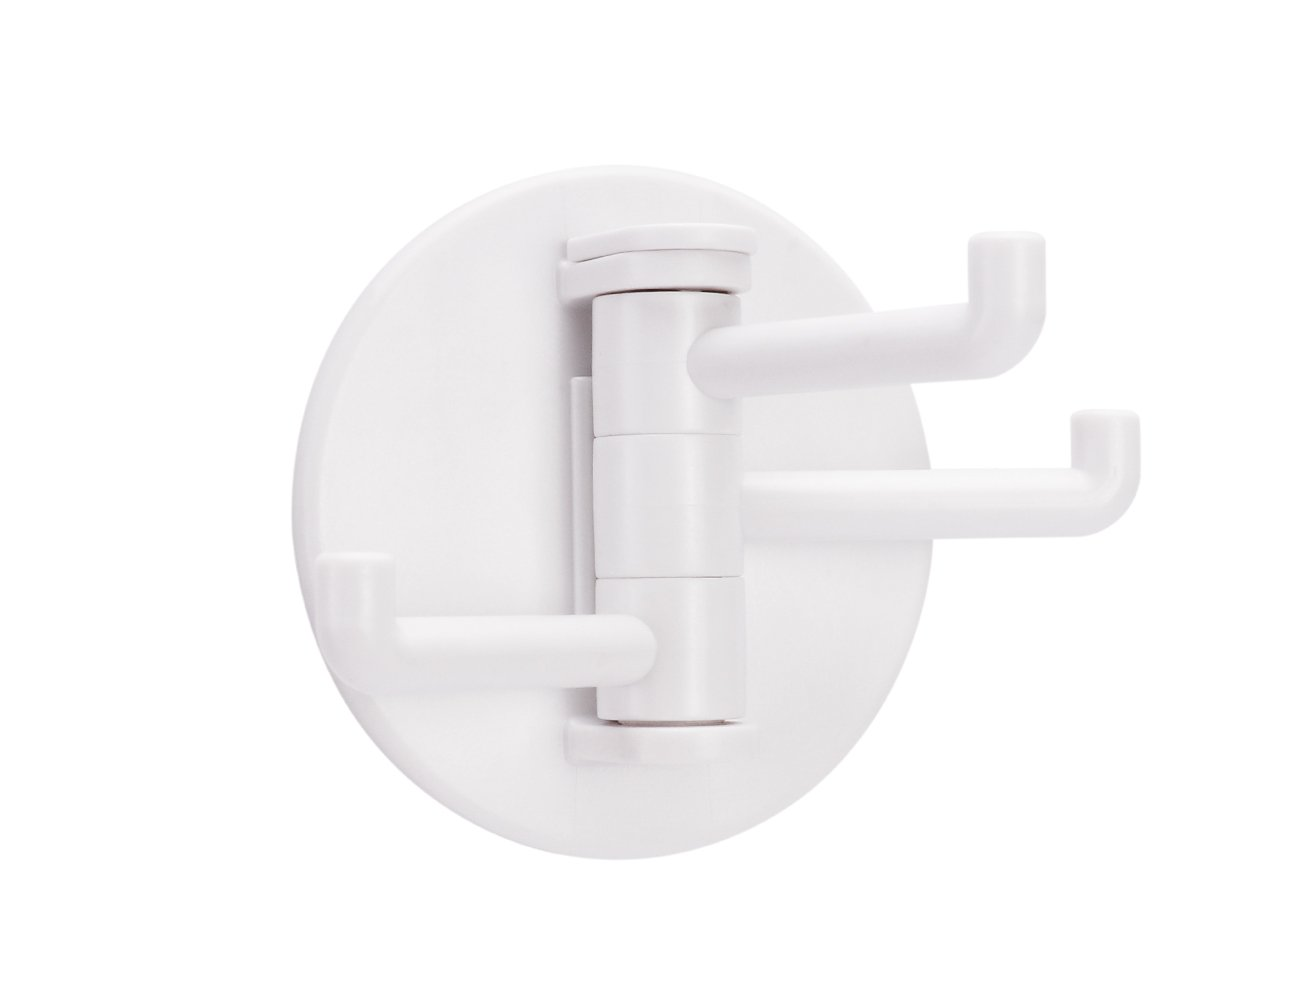 White Hooks, Hangers Stick On Wall Hooks,Bathroom Or Kitchen Wall Hooks (ABS plastic Hooks,2 Piece).